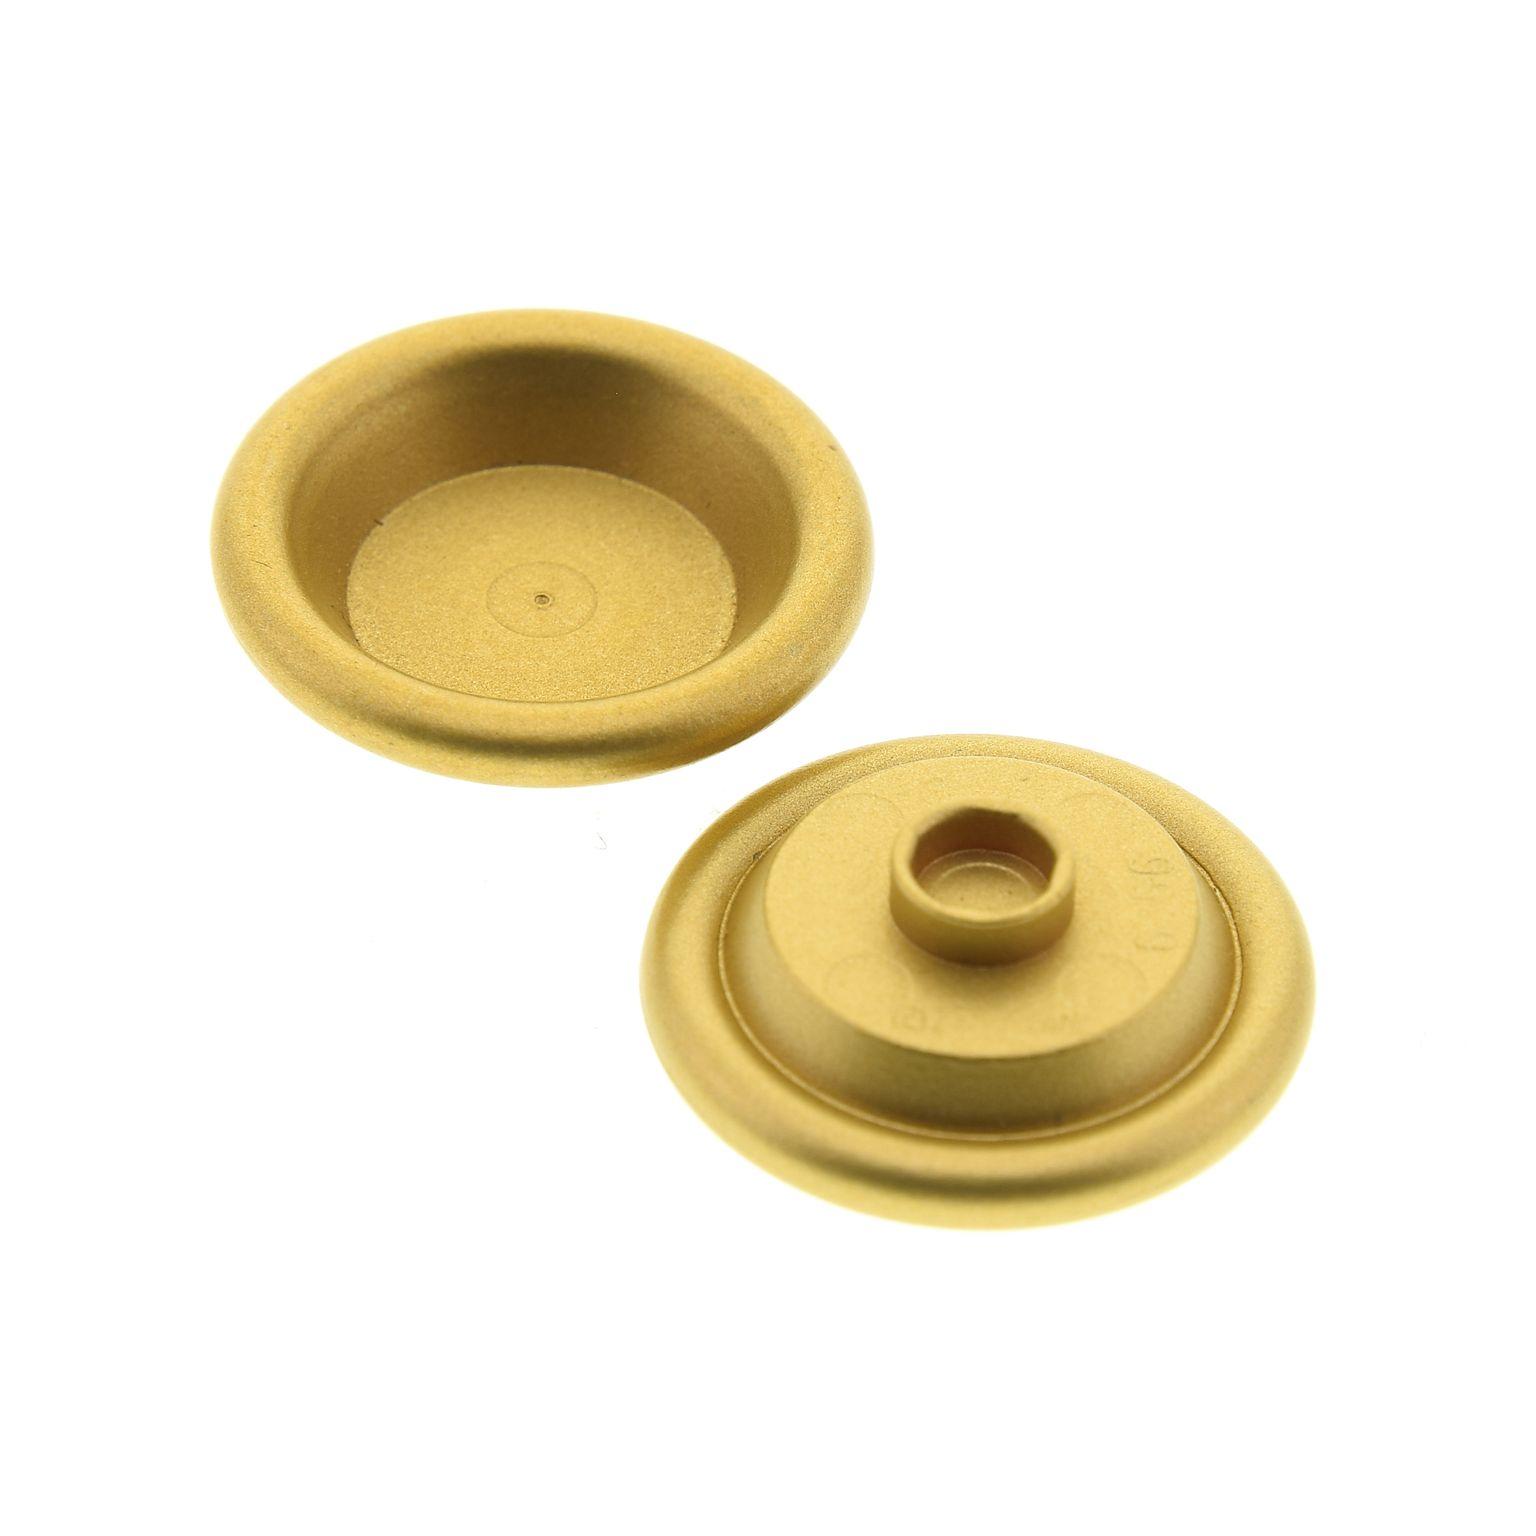 2 X Lego Brick Metallic Gold Minifig Utensil Dish 3 X 3 4842 9474